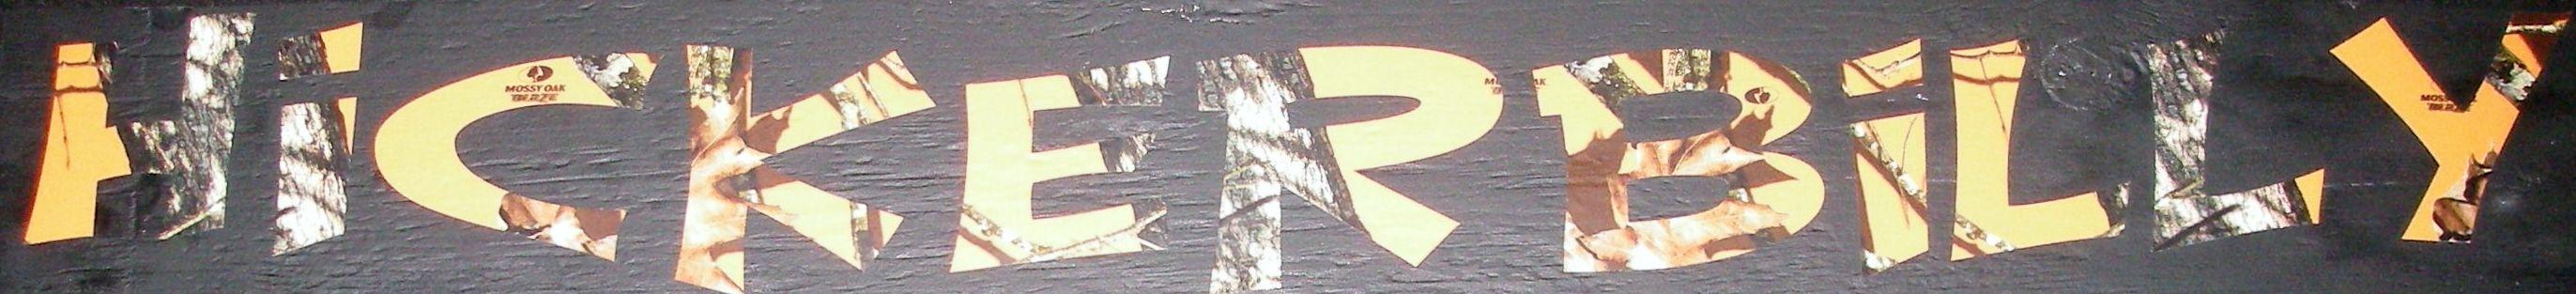 Mossy Oak Blaze Orange Vinyl Decals Blaze Orange Windshield